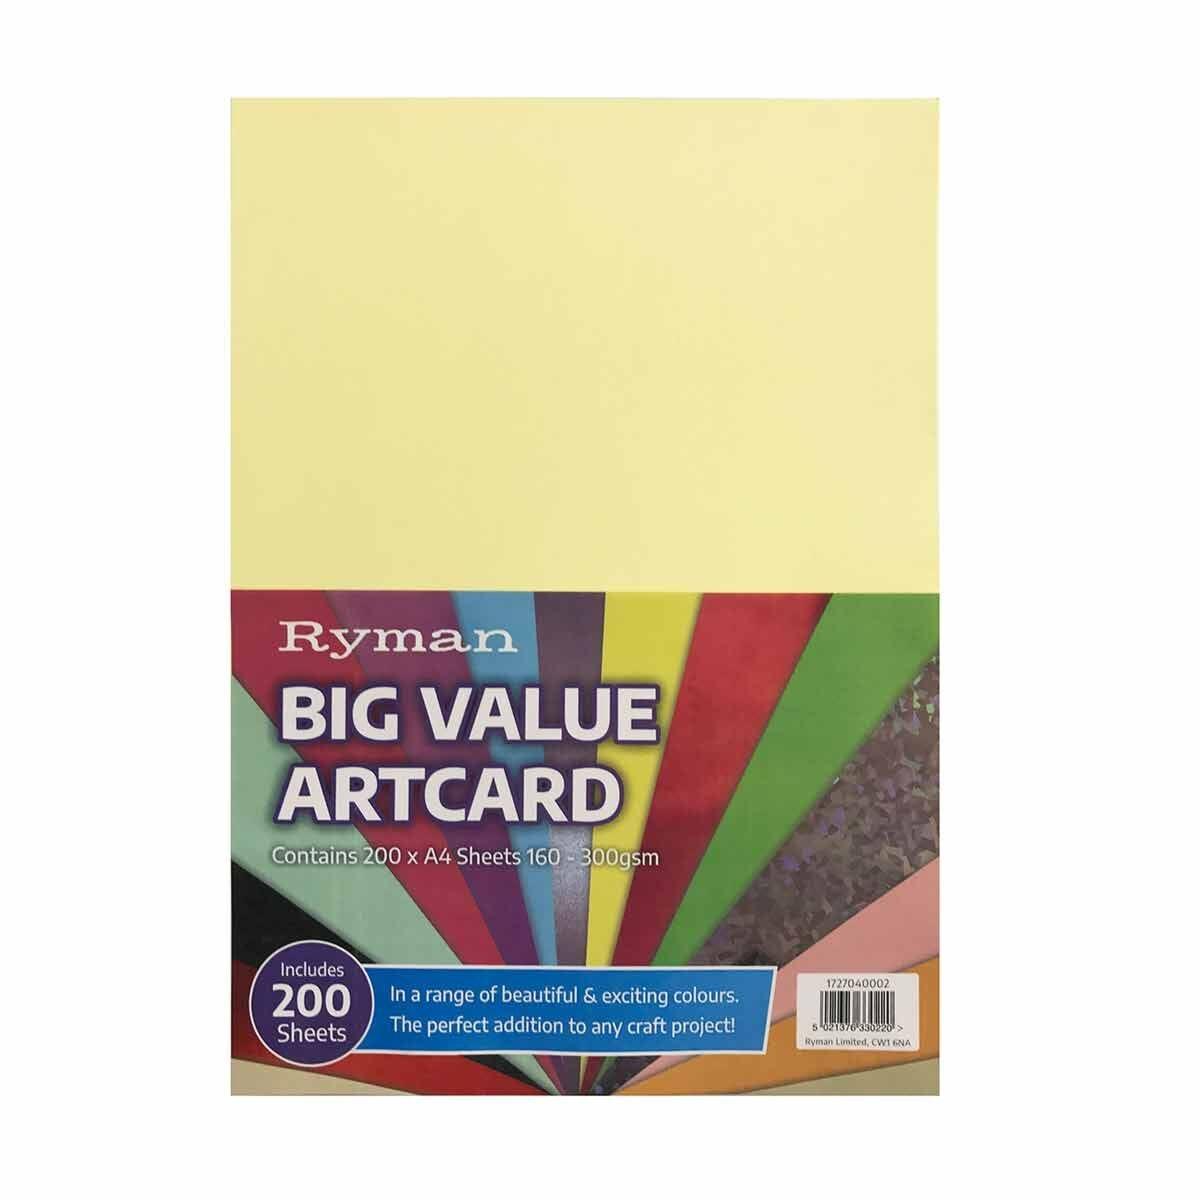 Ryman Big Value Artcard Pack of 200